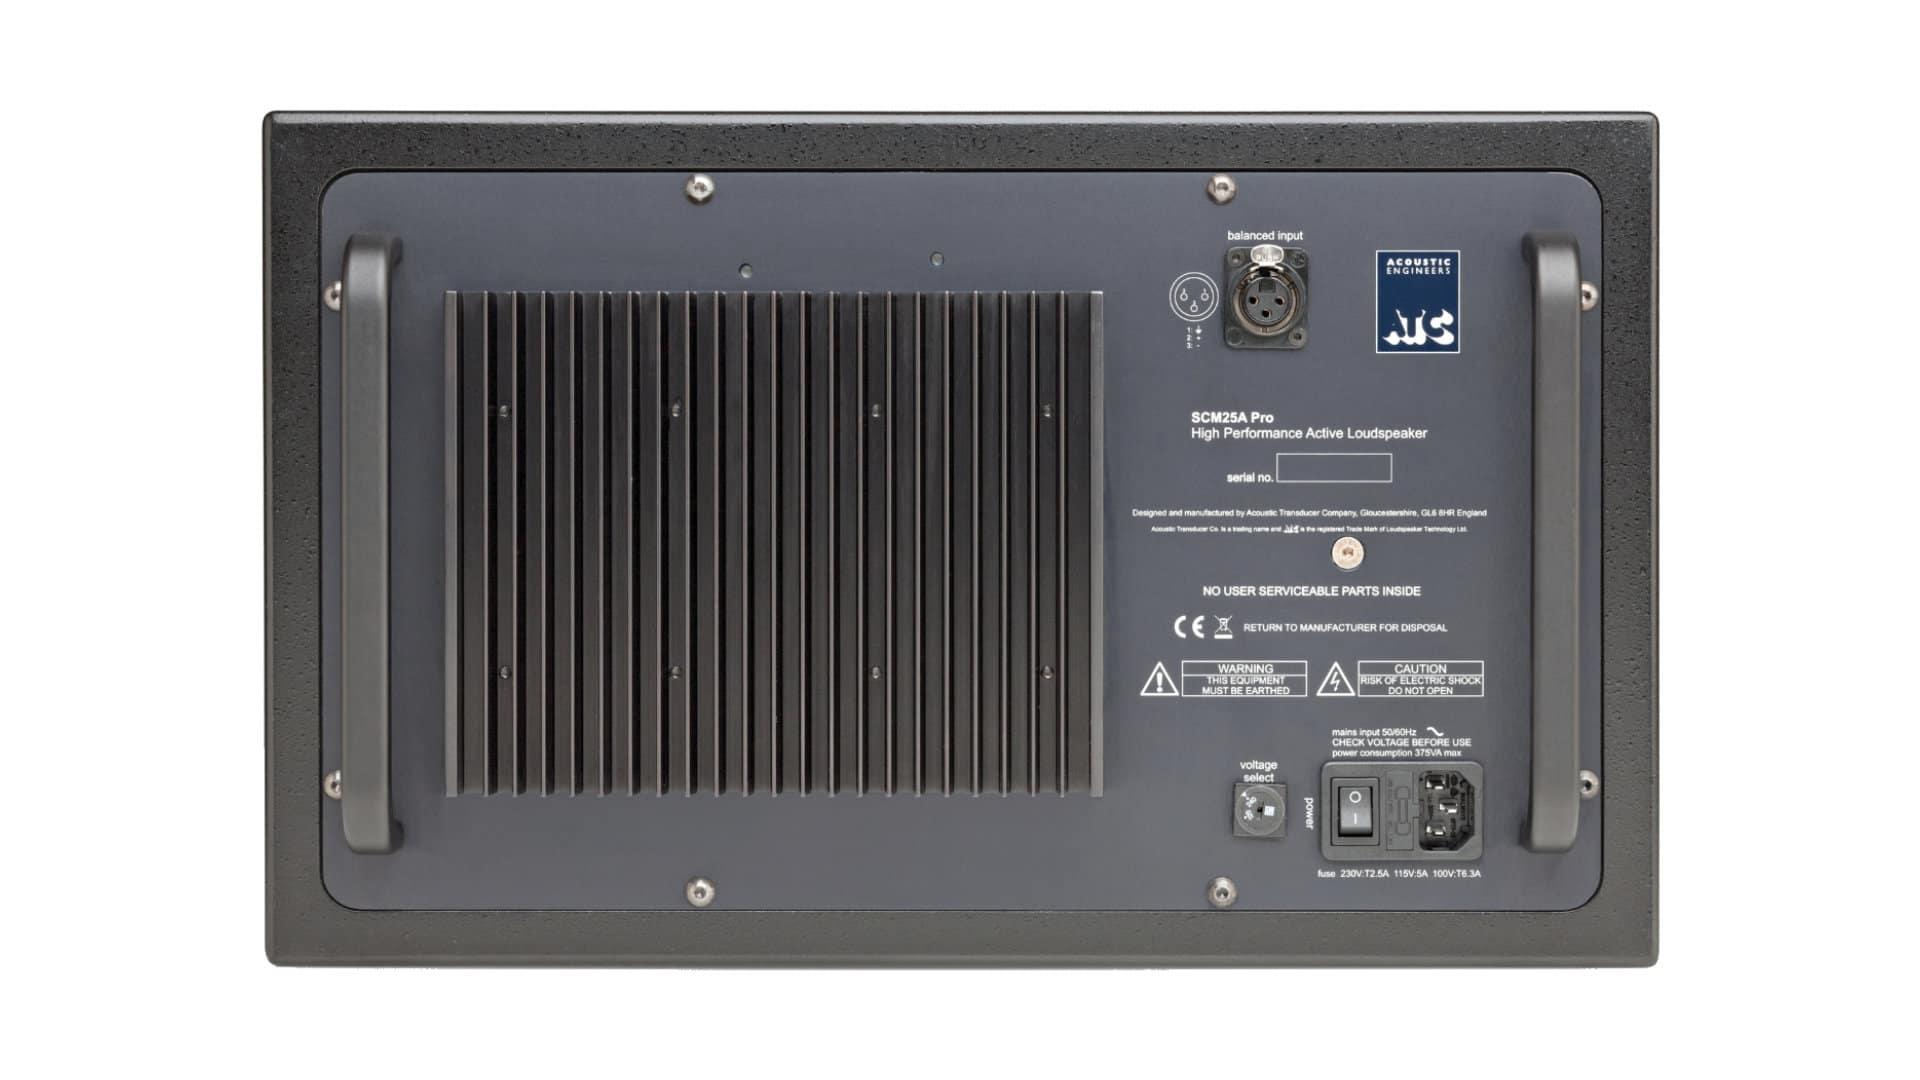 Monitor studyjny bliskiego pola ATC Loudspeakers SCM25A Pro